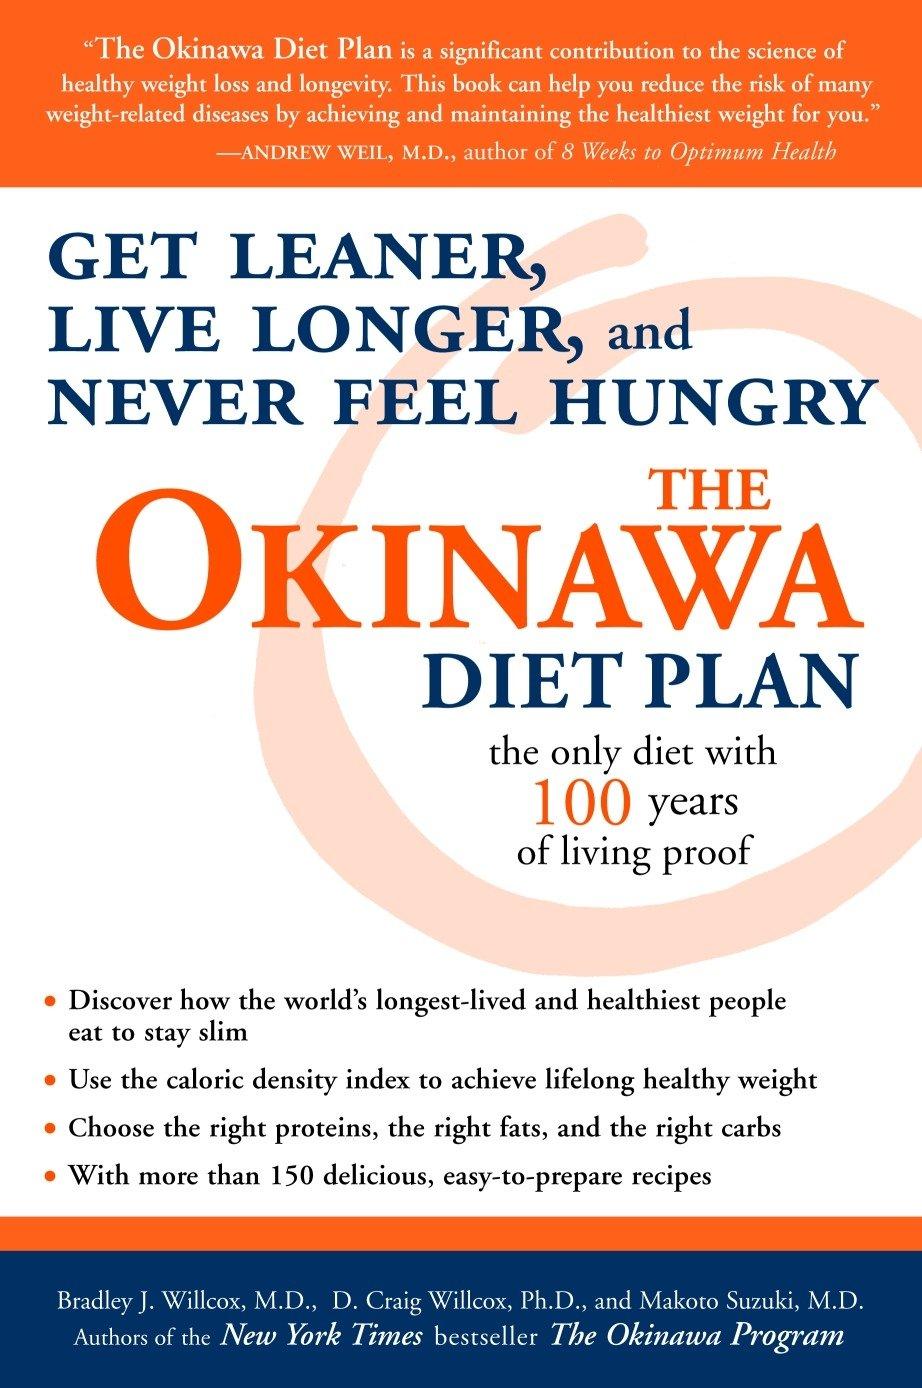 the okinawa diet plan book